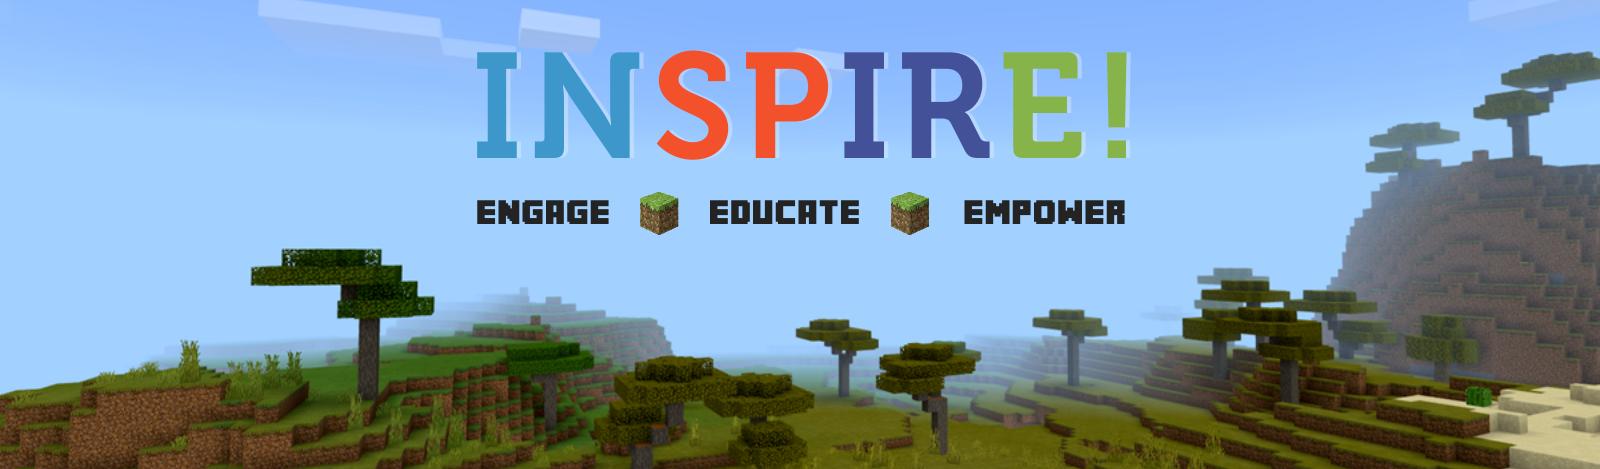 Inspire logo on Minecraft landscape